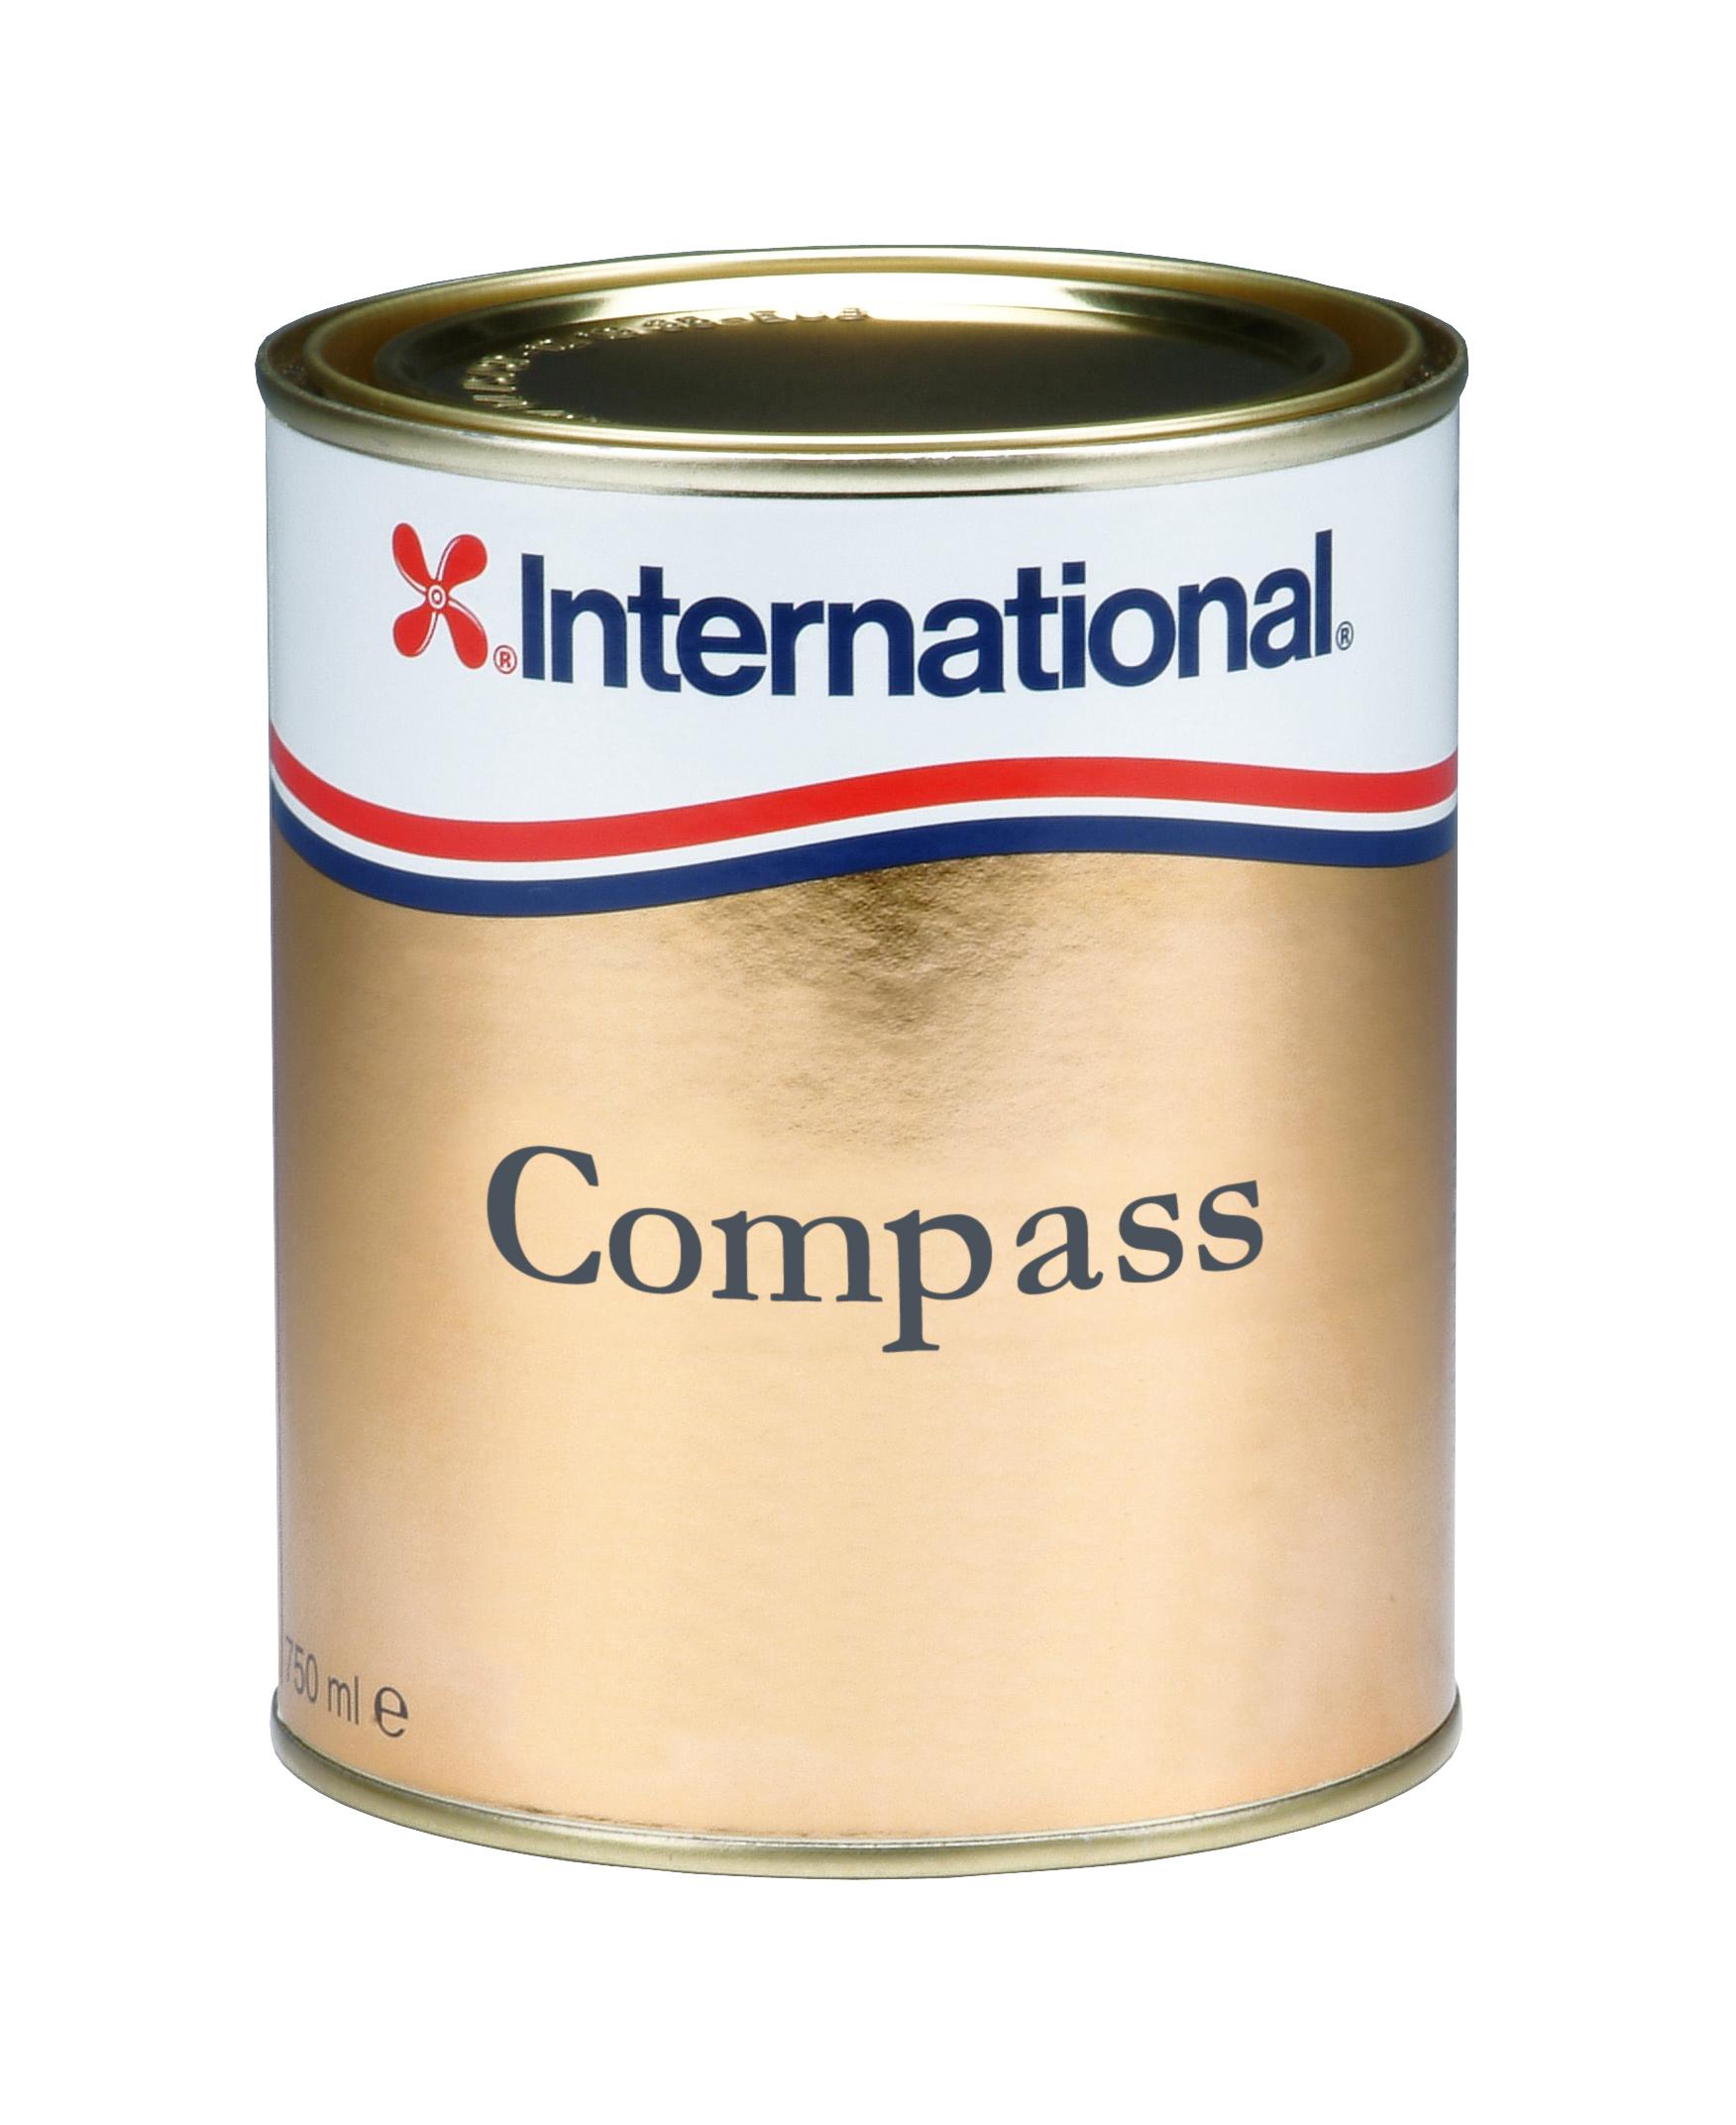 Compass 075 l.